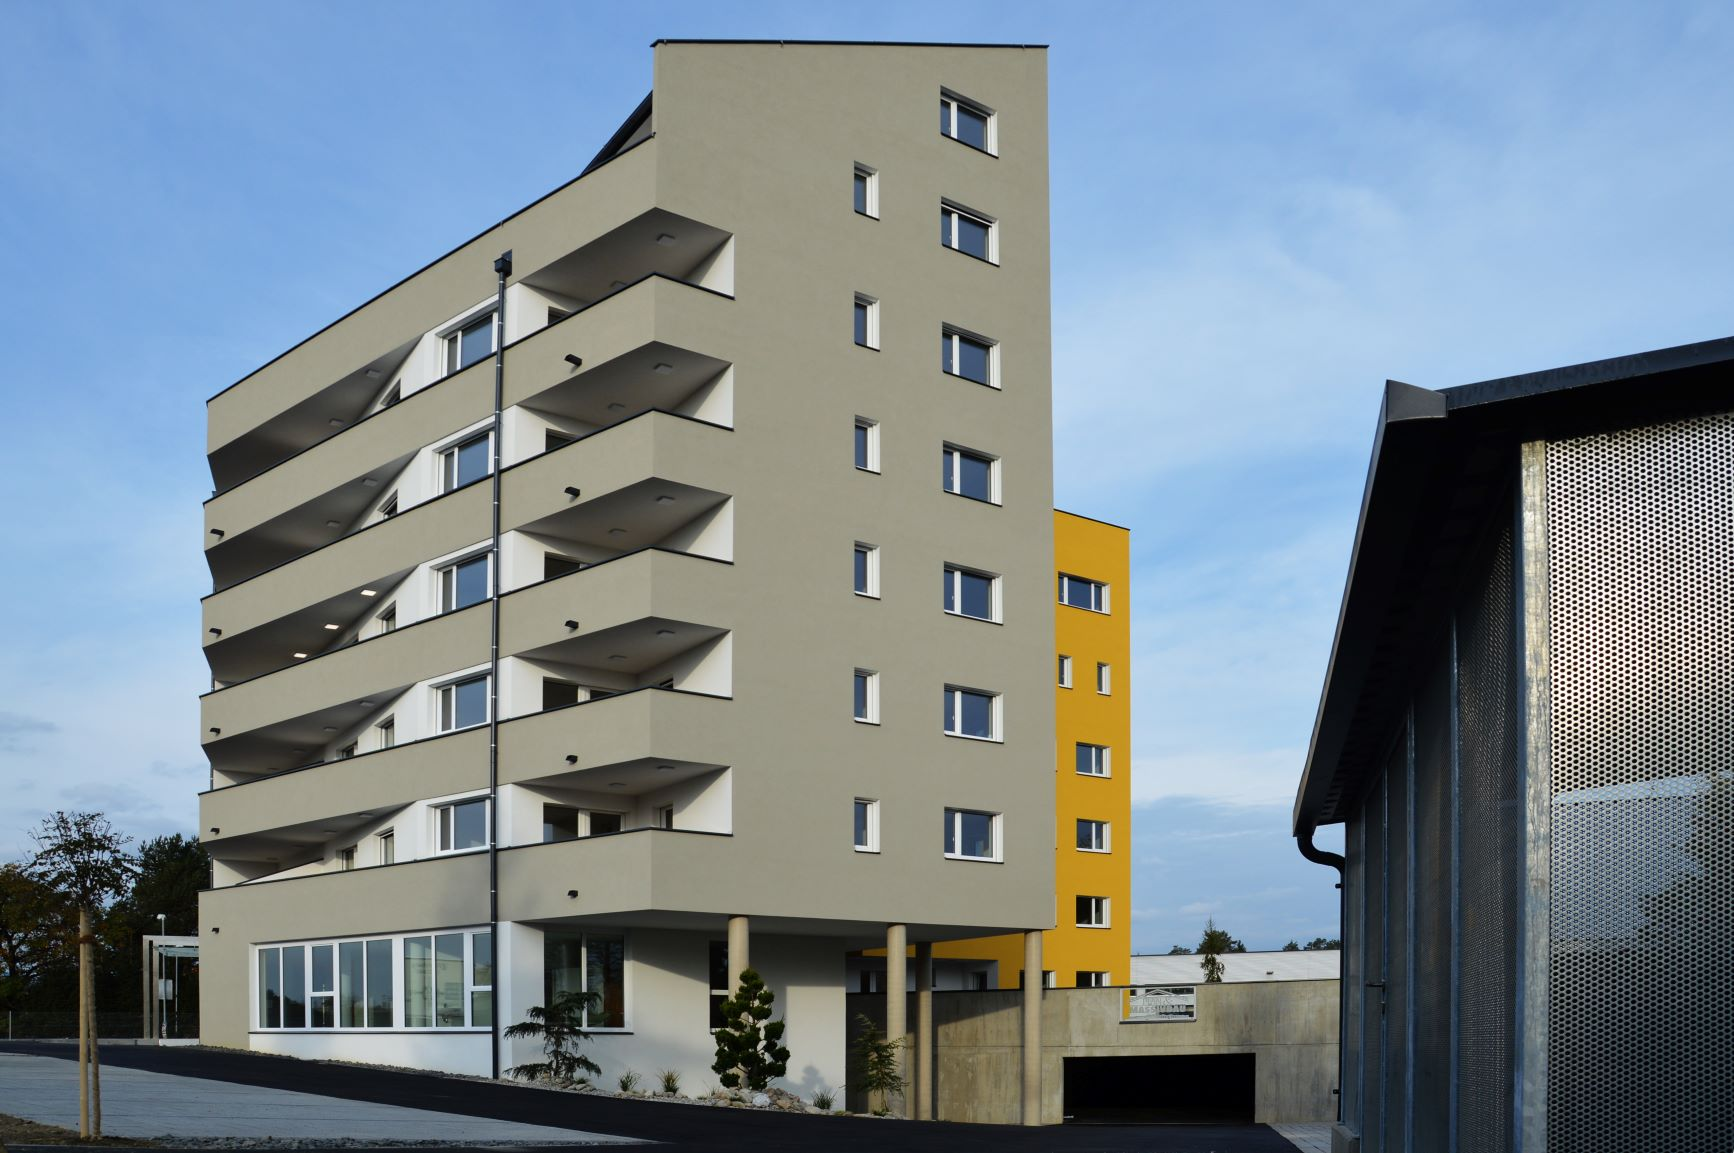 Baufirma Kiegerl Wohnanlage THT